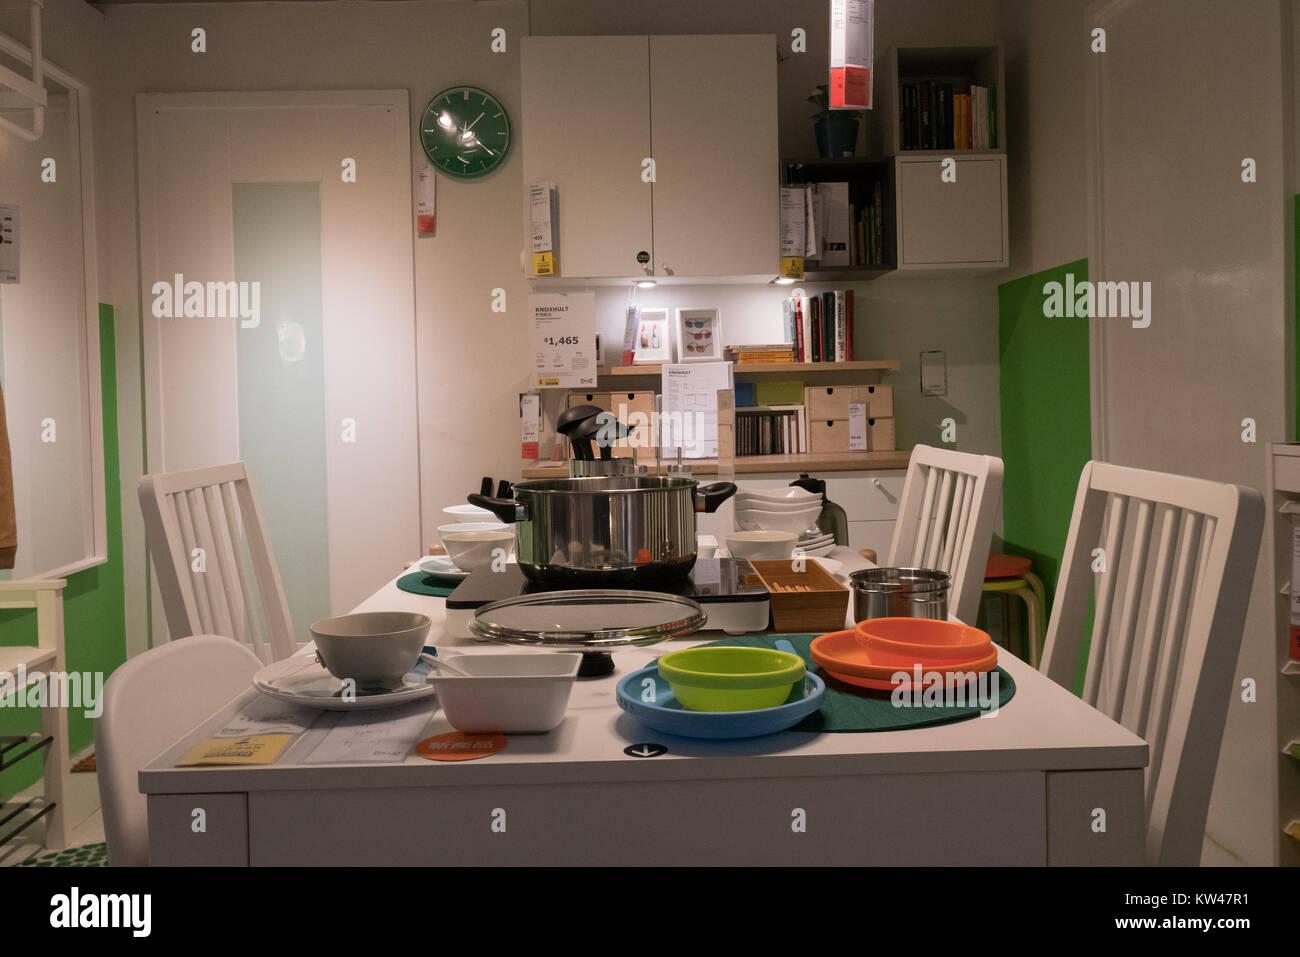 ikea interior stock photos ikea interior stock images alamy. Black Bedroom Furniture Sets. Home Design Ideas